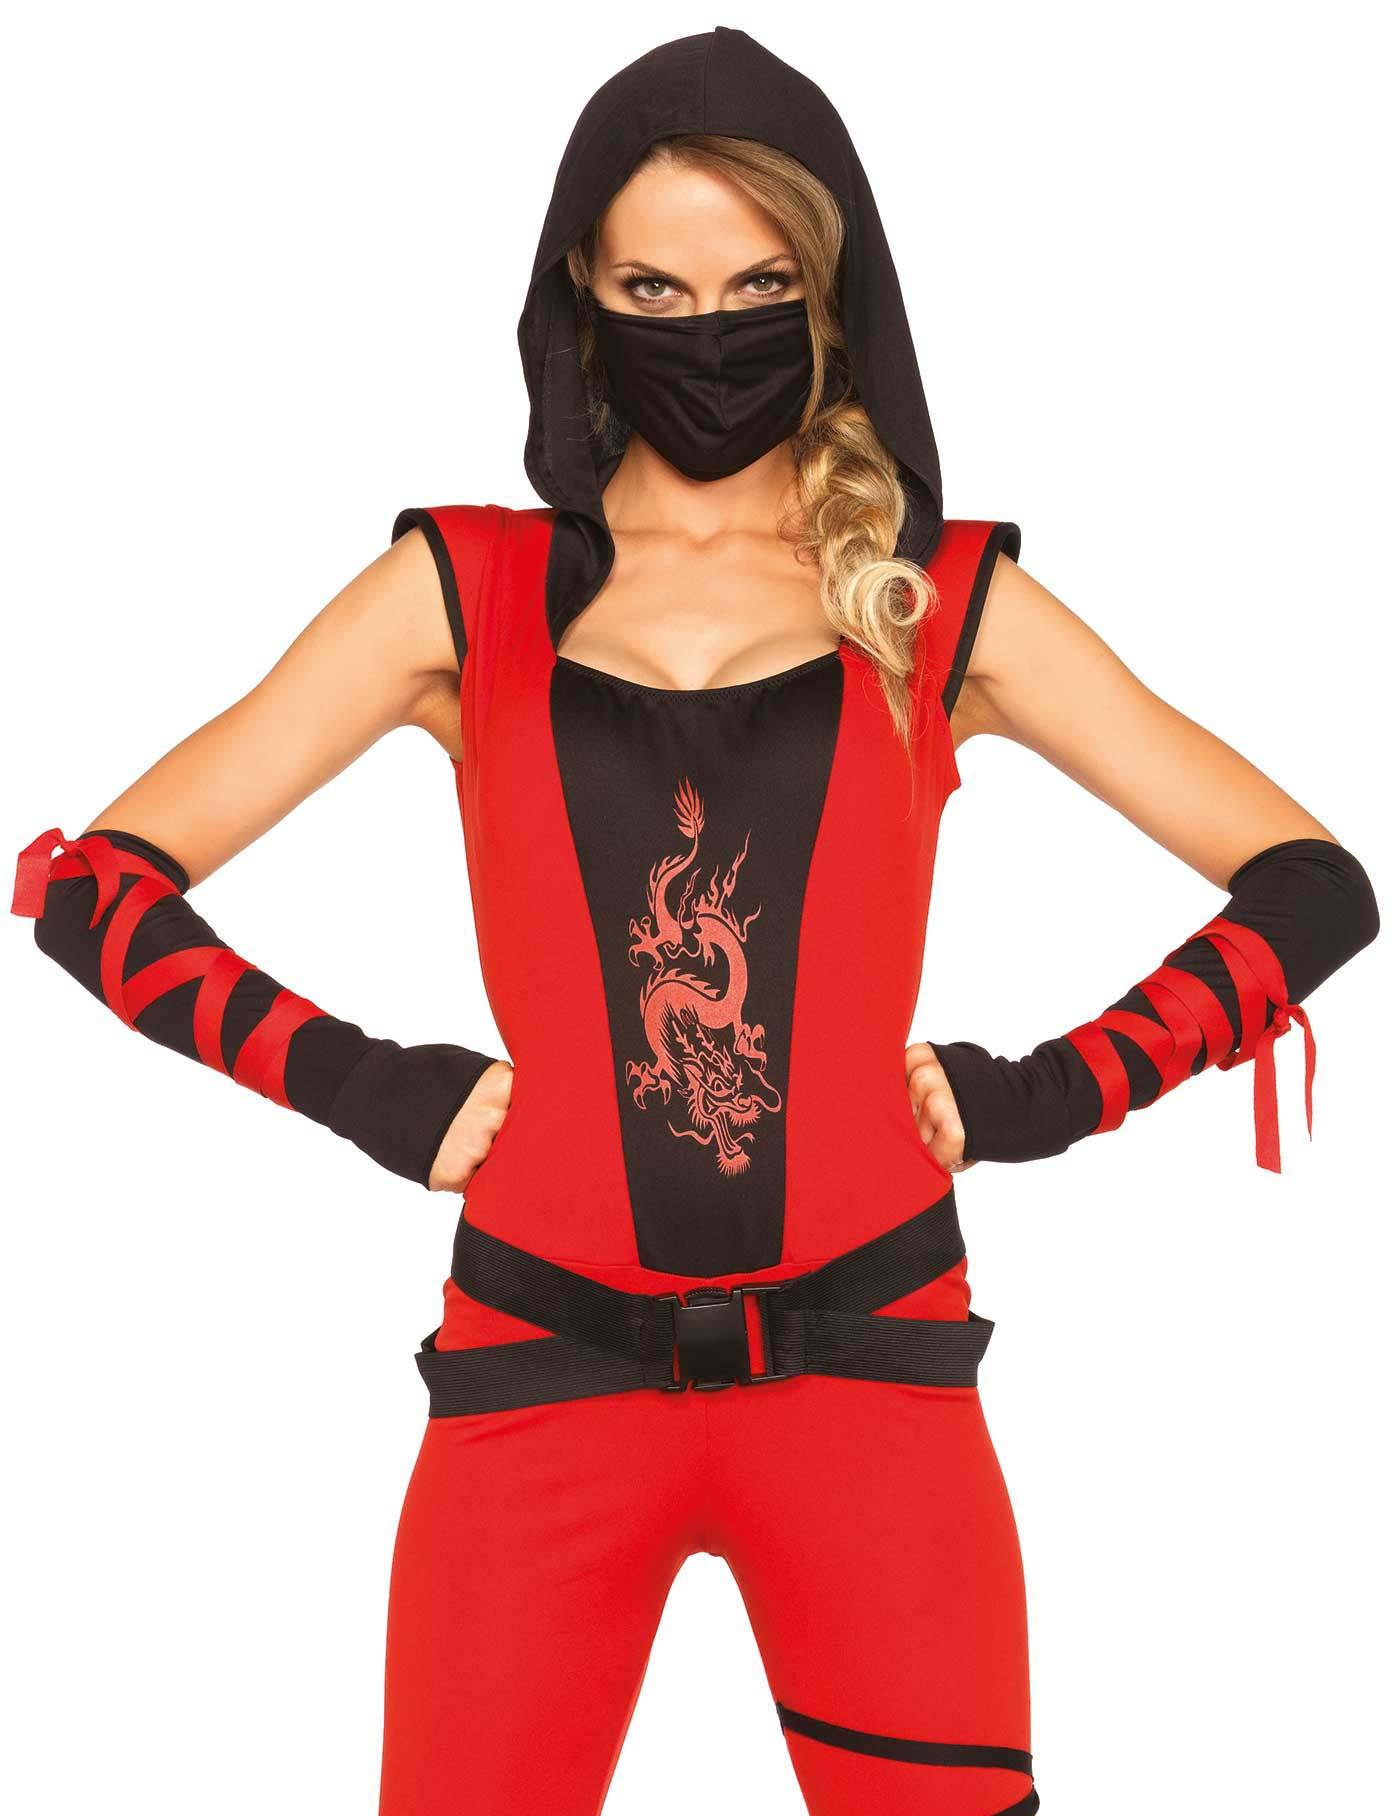 ninja kost m f r frauen kost me f r erwachsene und. Black Bedroom Furniture Sets. Home Design Ideas